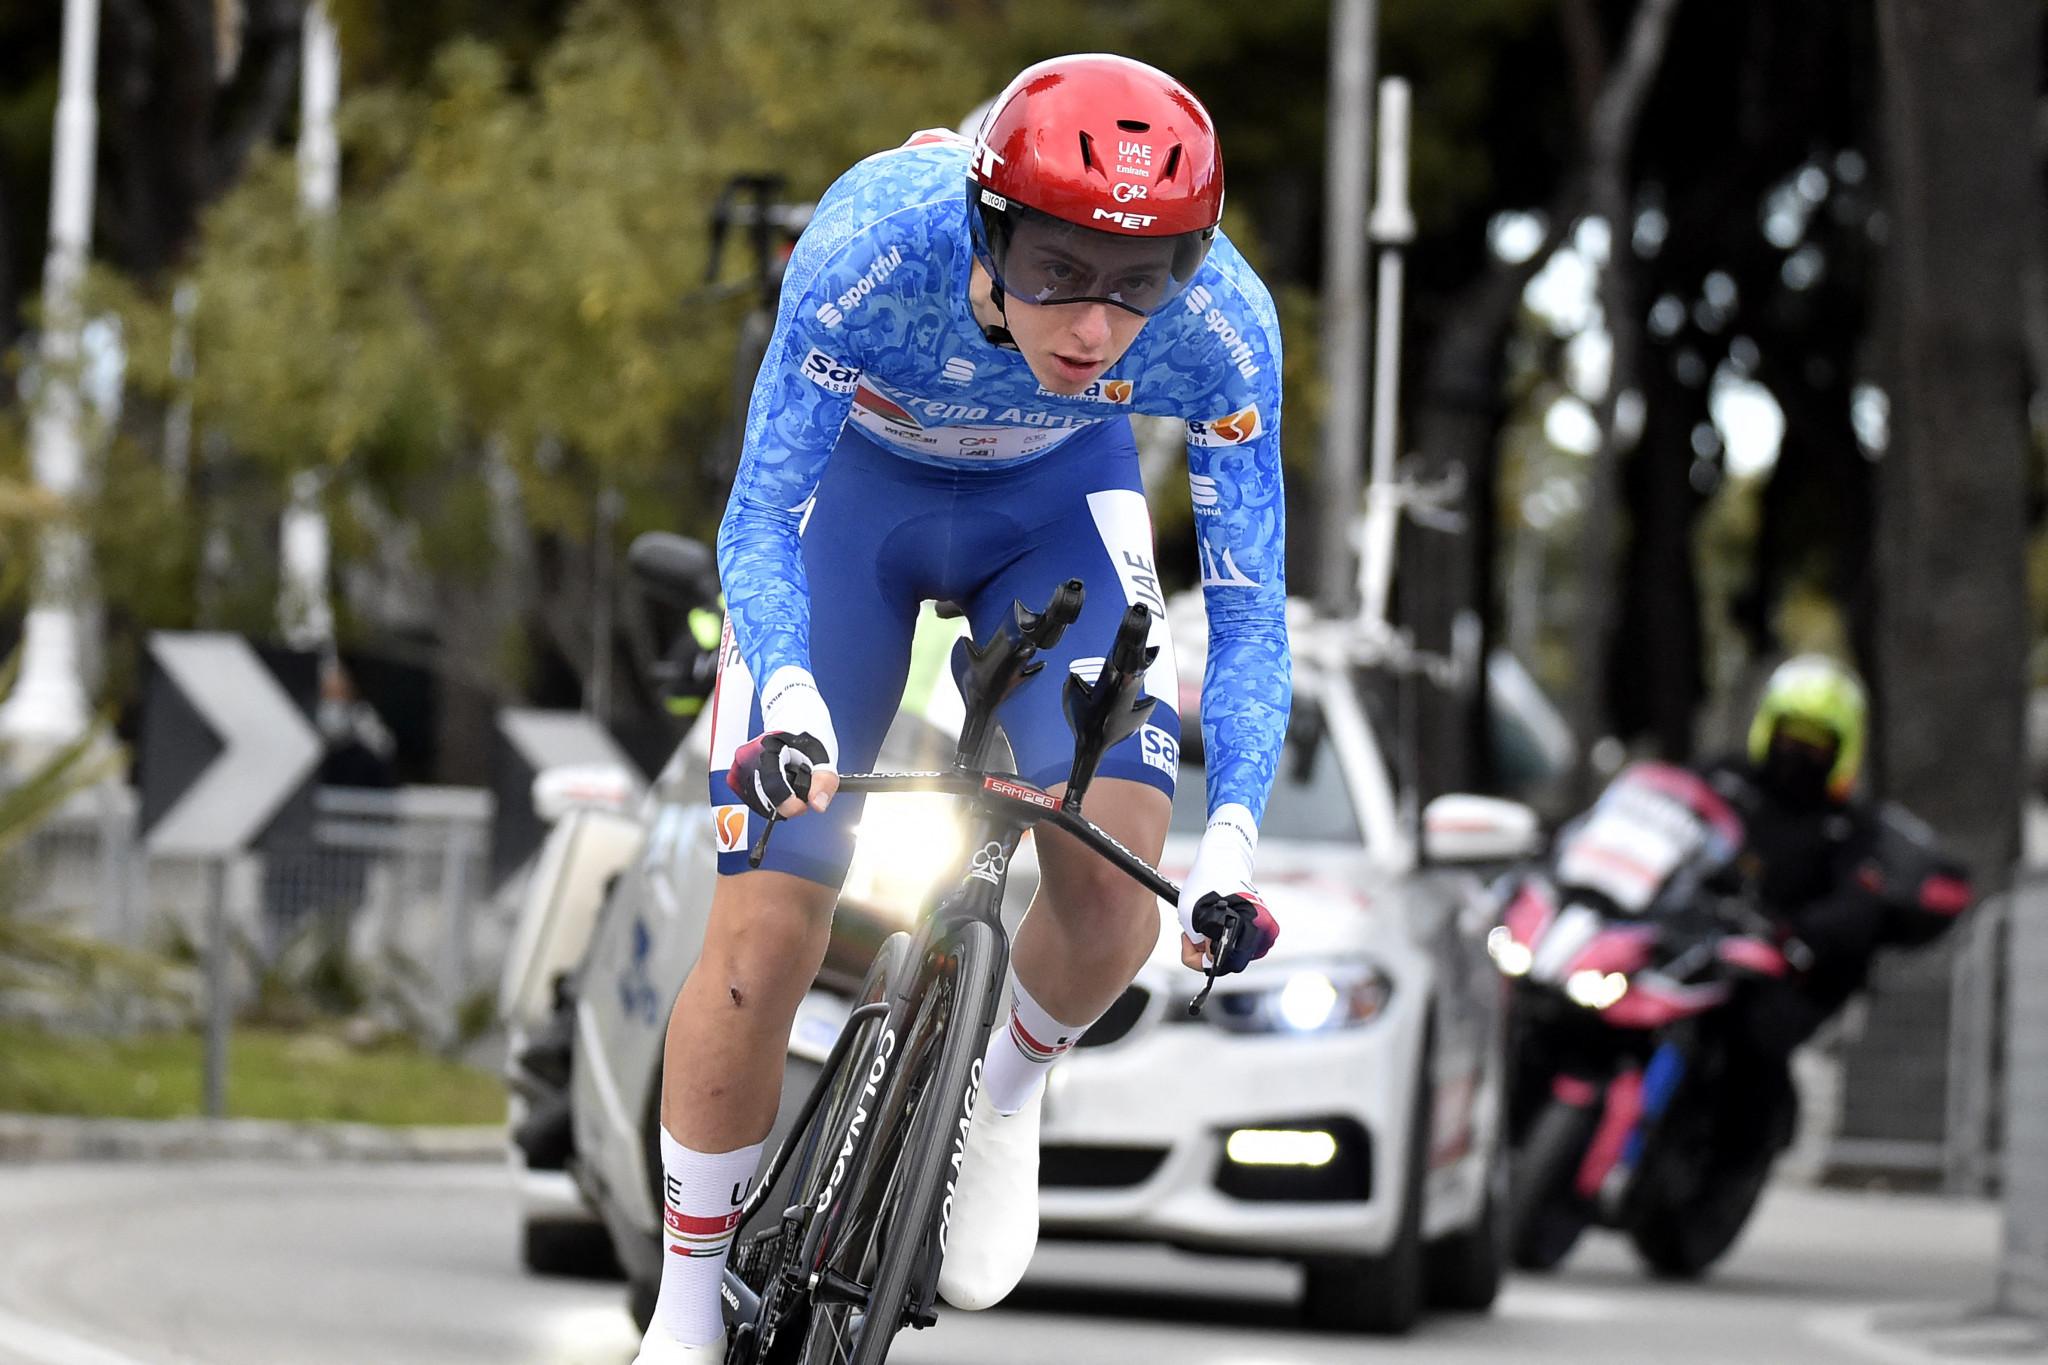 Pogačar wins Tirreno-Adriatico as Van Aert ends Ganna's time-trial streak